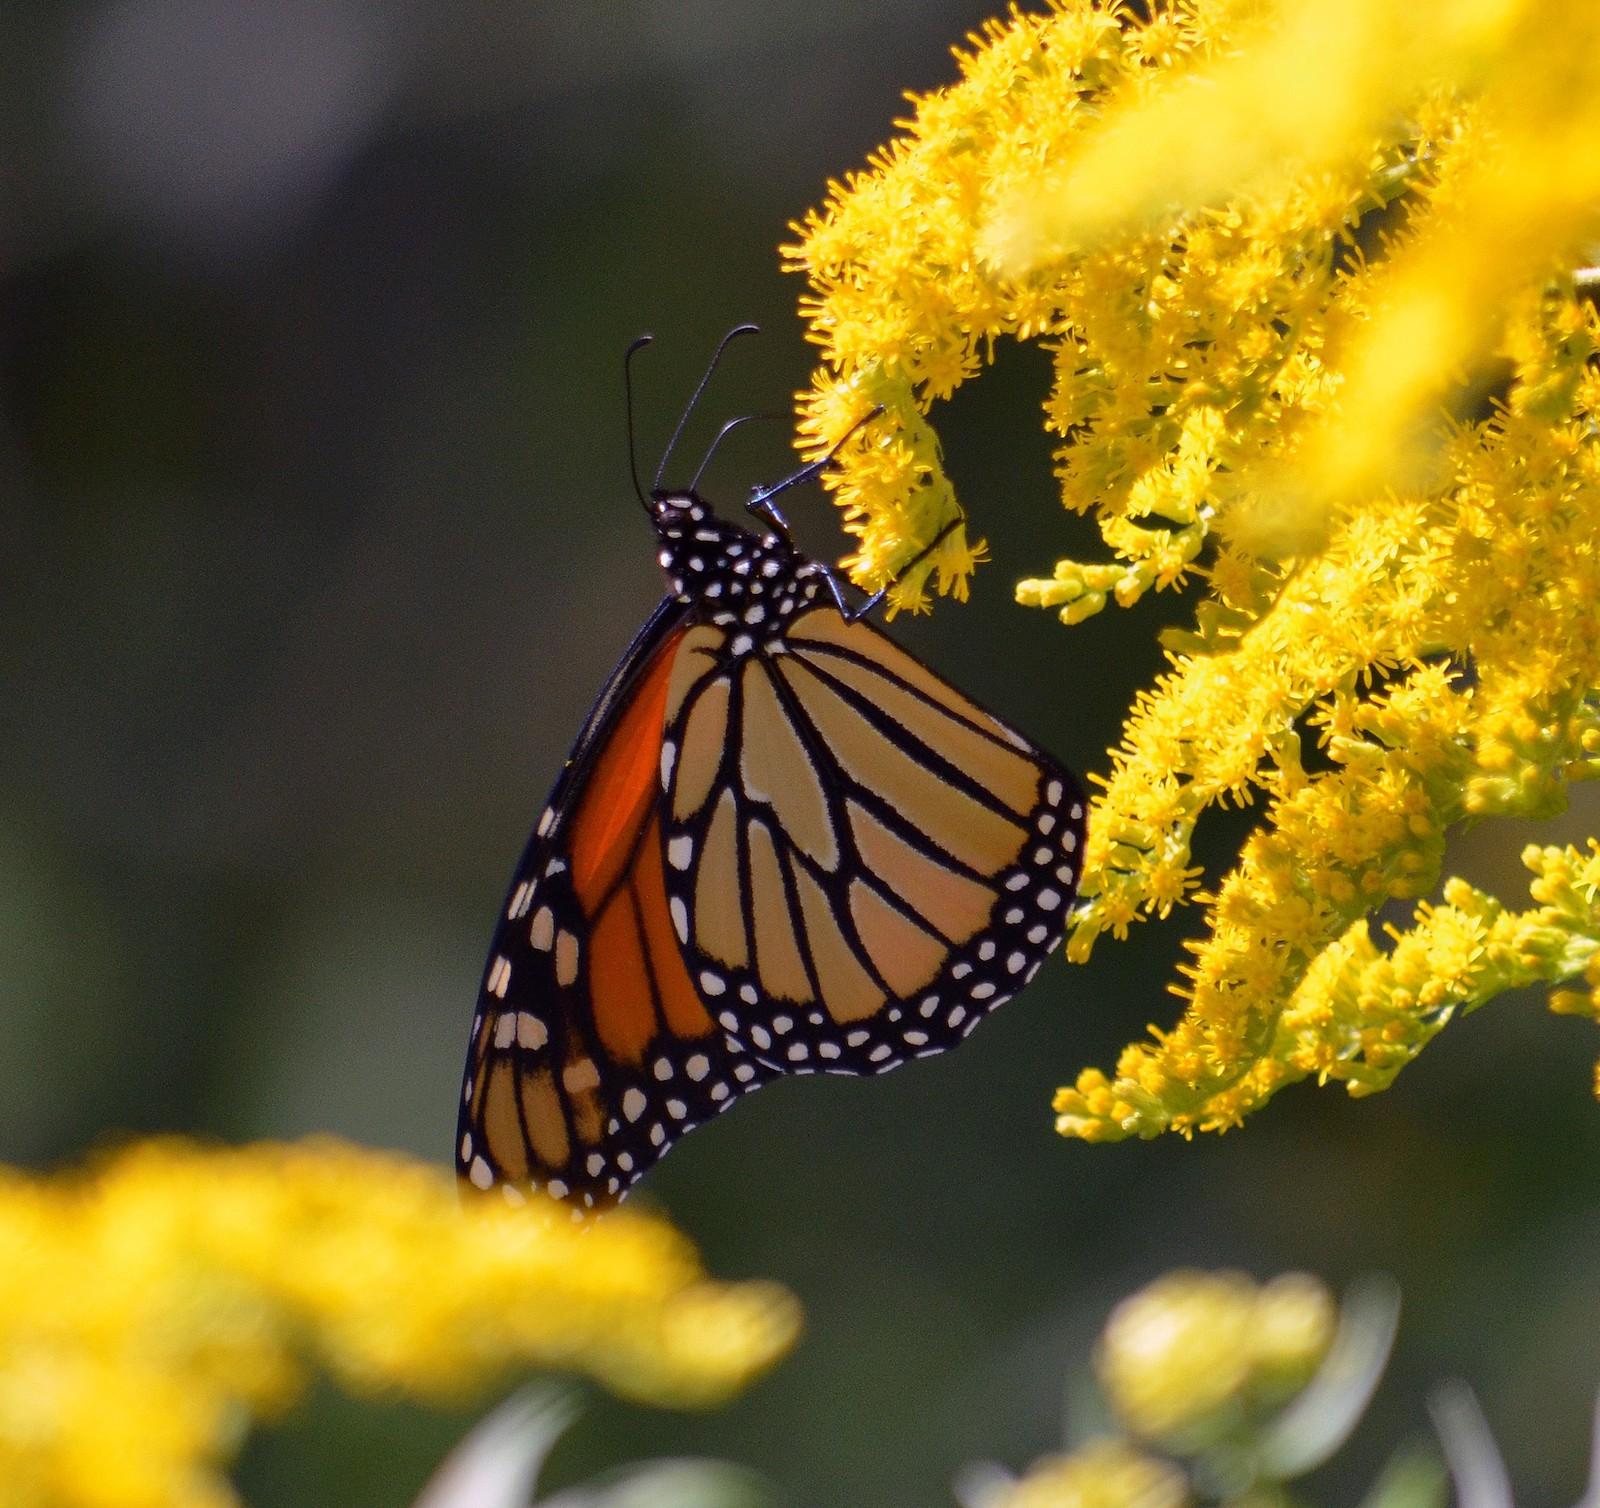 a monach butterfly on a golden flower spray